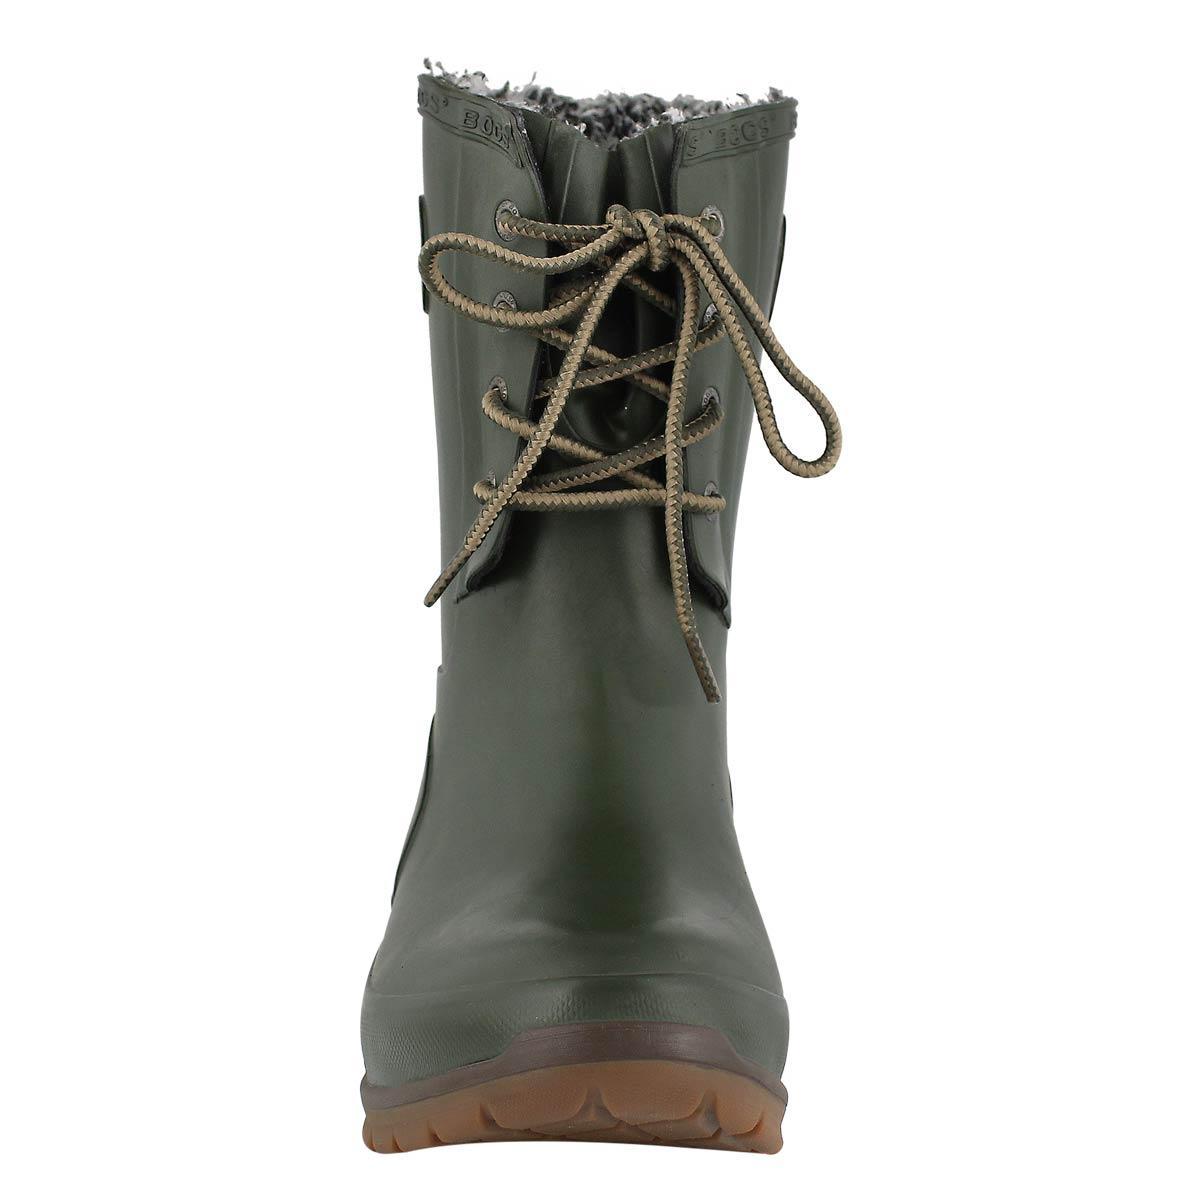 Lds Amanda Plush Lace dk green wtpf boot